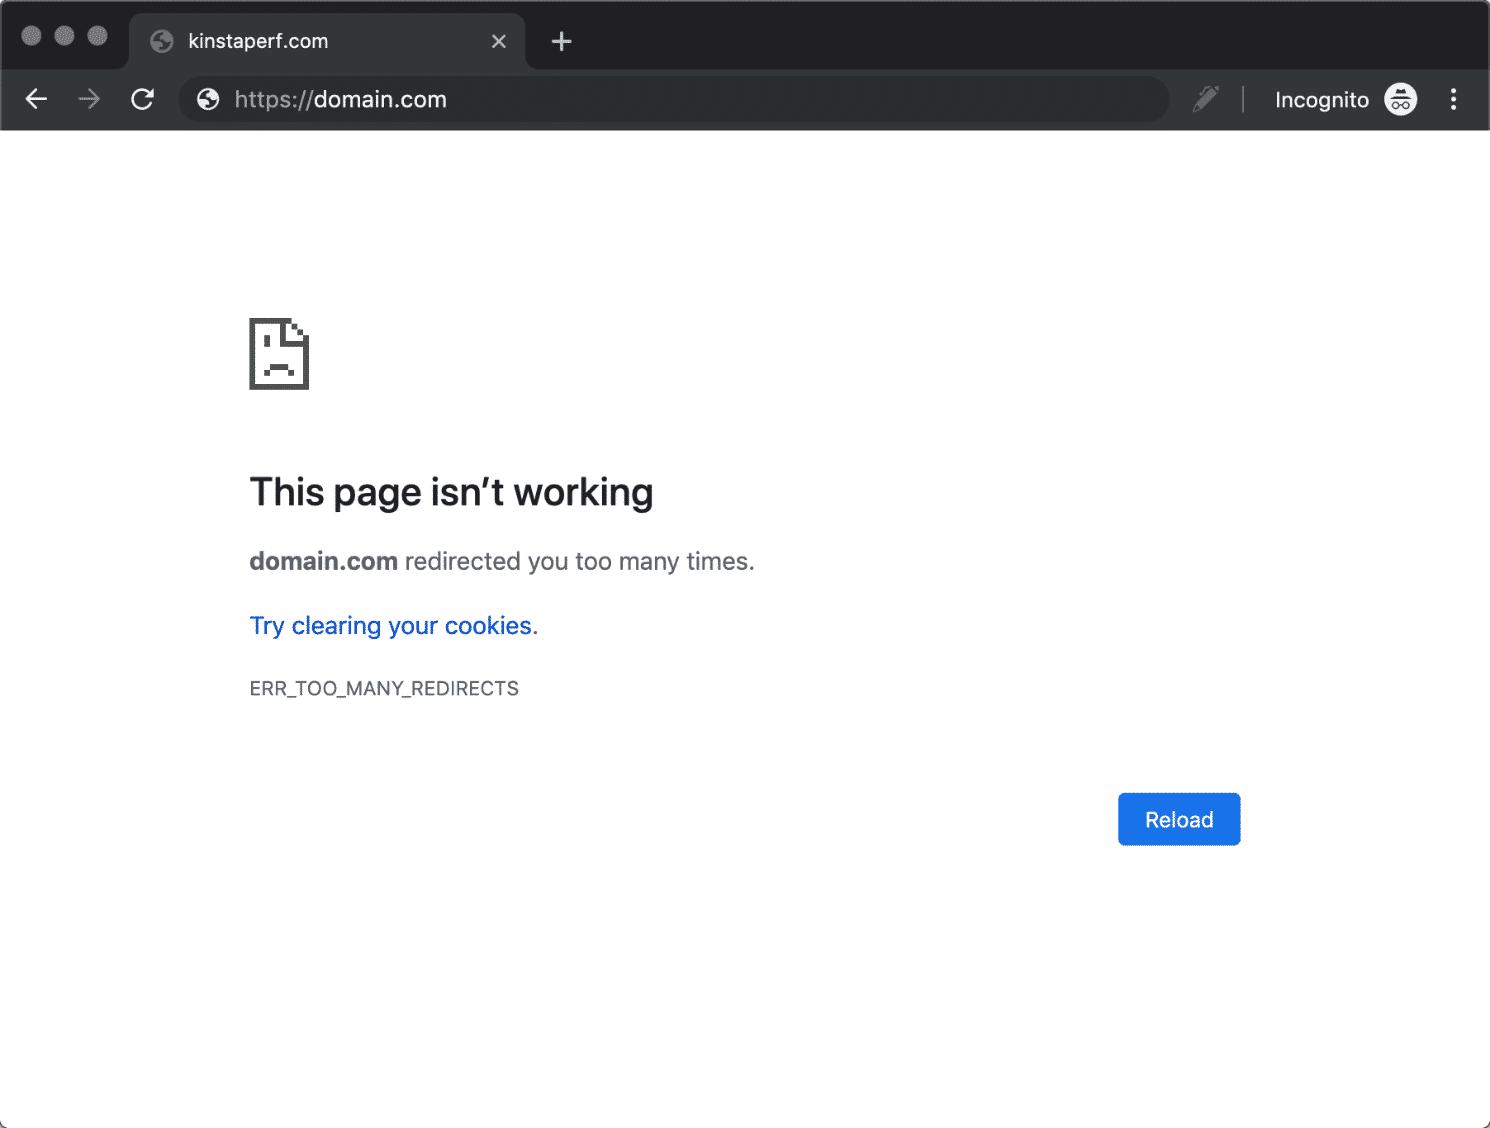 ERR_TOO_MANY_REDIRECTS dans Google Chrome